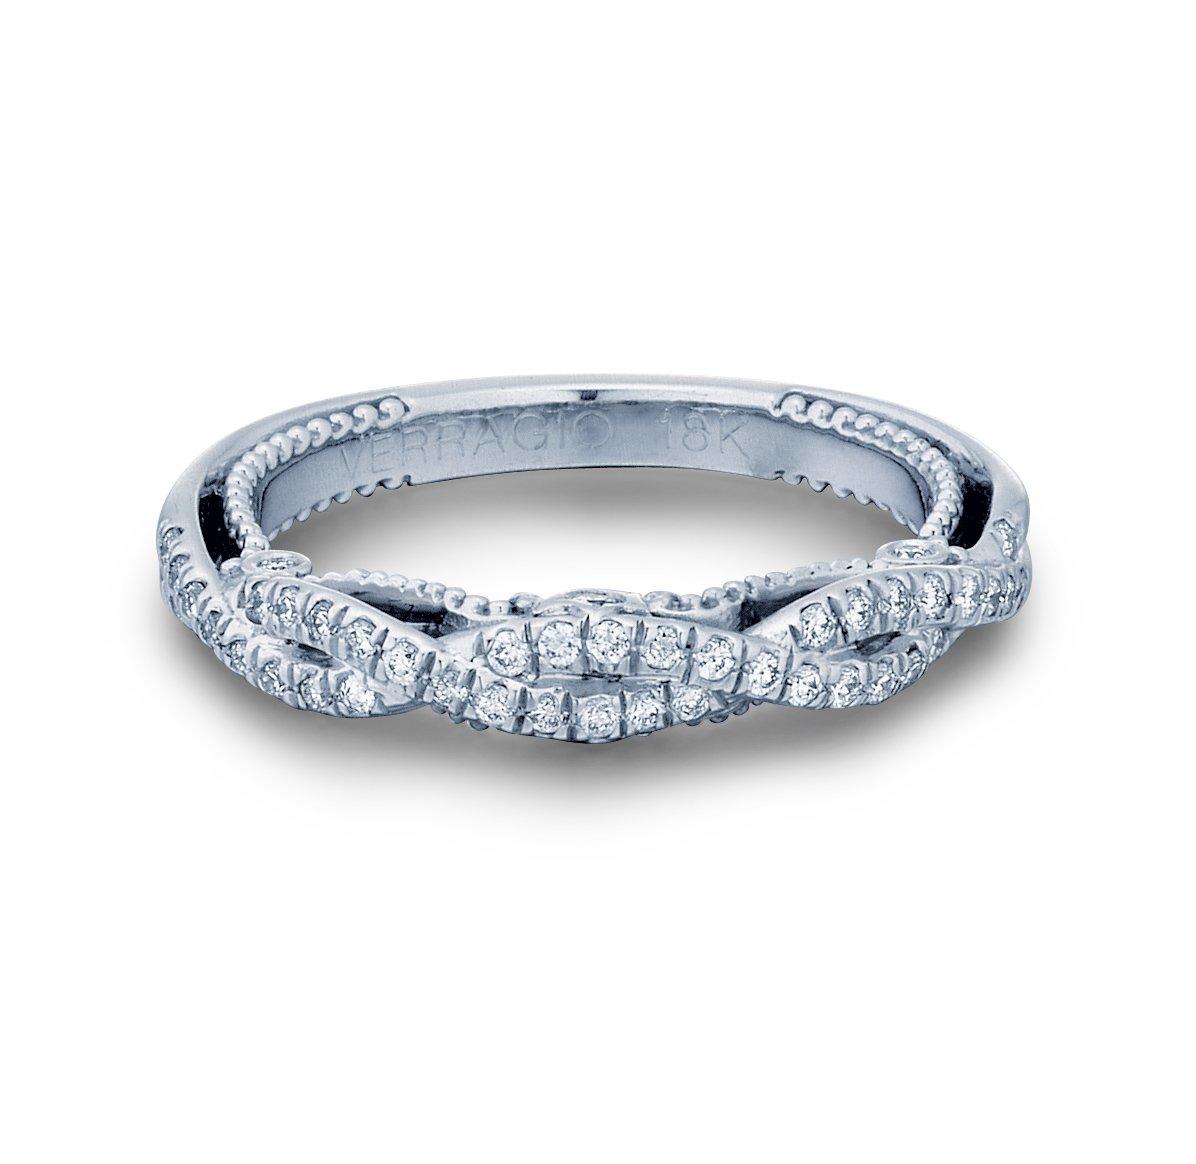 9f40237b2e7 VERRAGIO Diamond Curved White Gold Womens Wedding bands. Designer Engagement  Rings   Fine Jewelry  Arthur s Jewelers